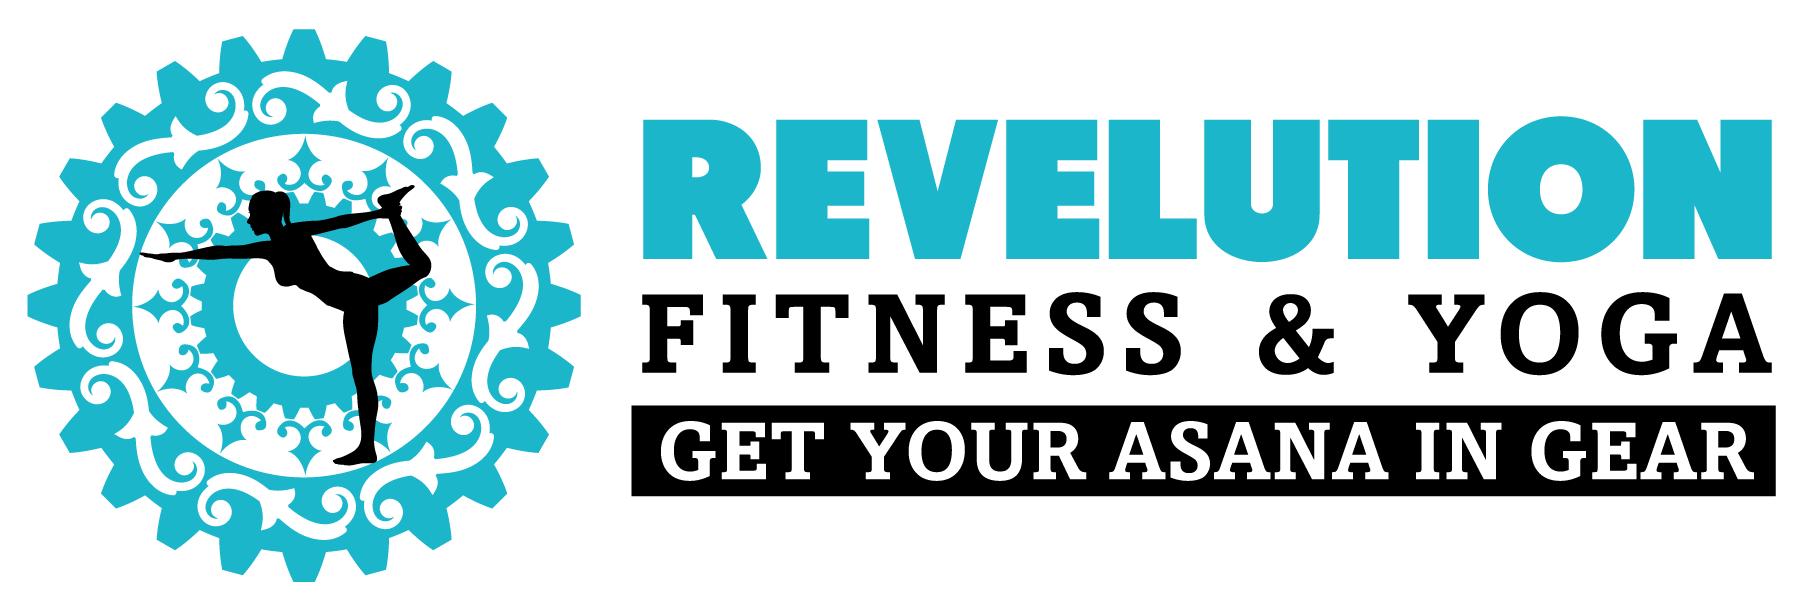 Revelution Fitness & Yoga